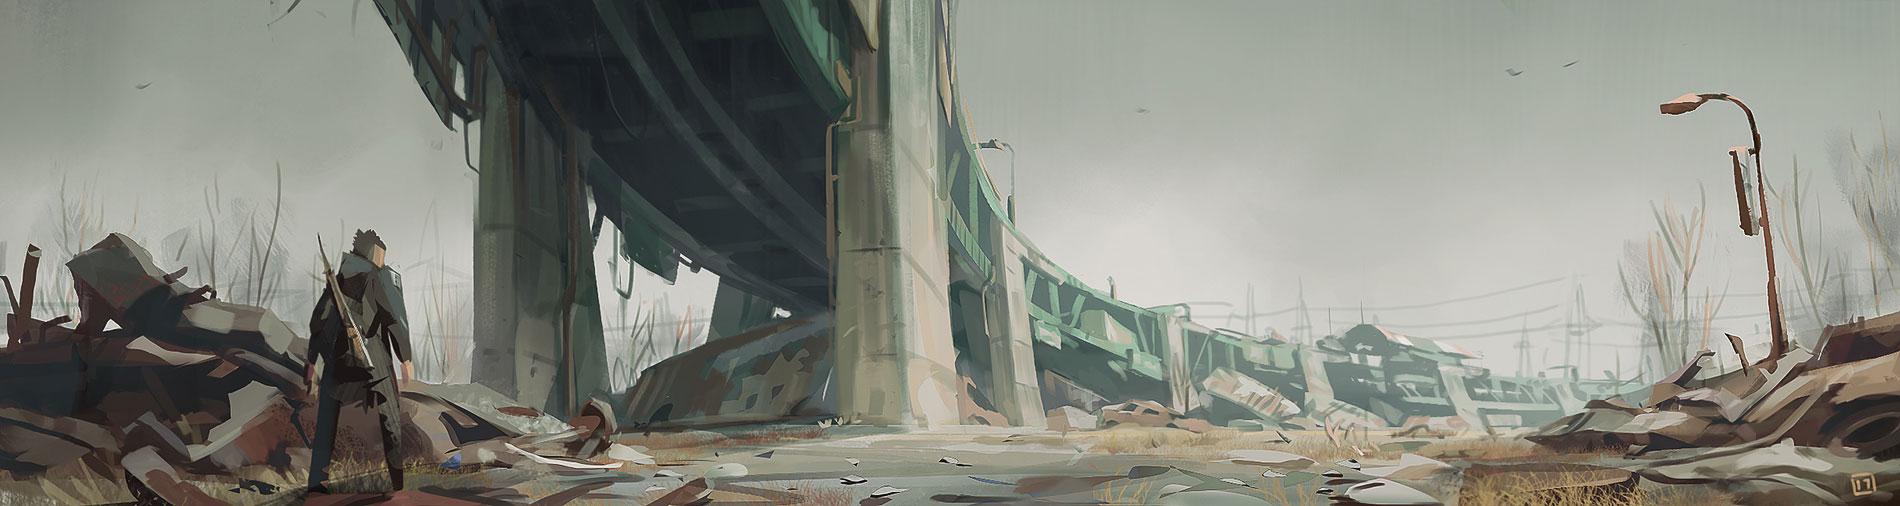 Bethesda přibližuje překopaný Survival režim ve Falloutu 4 121571